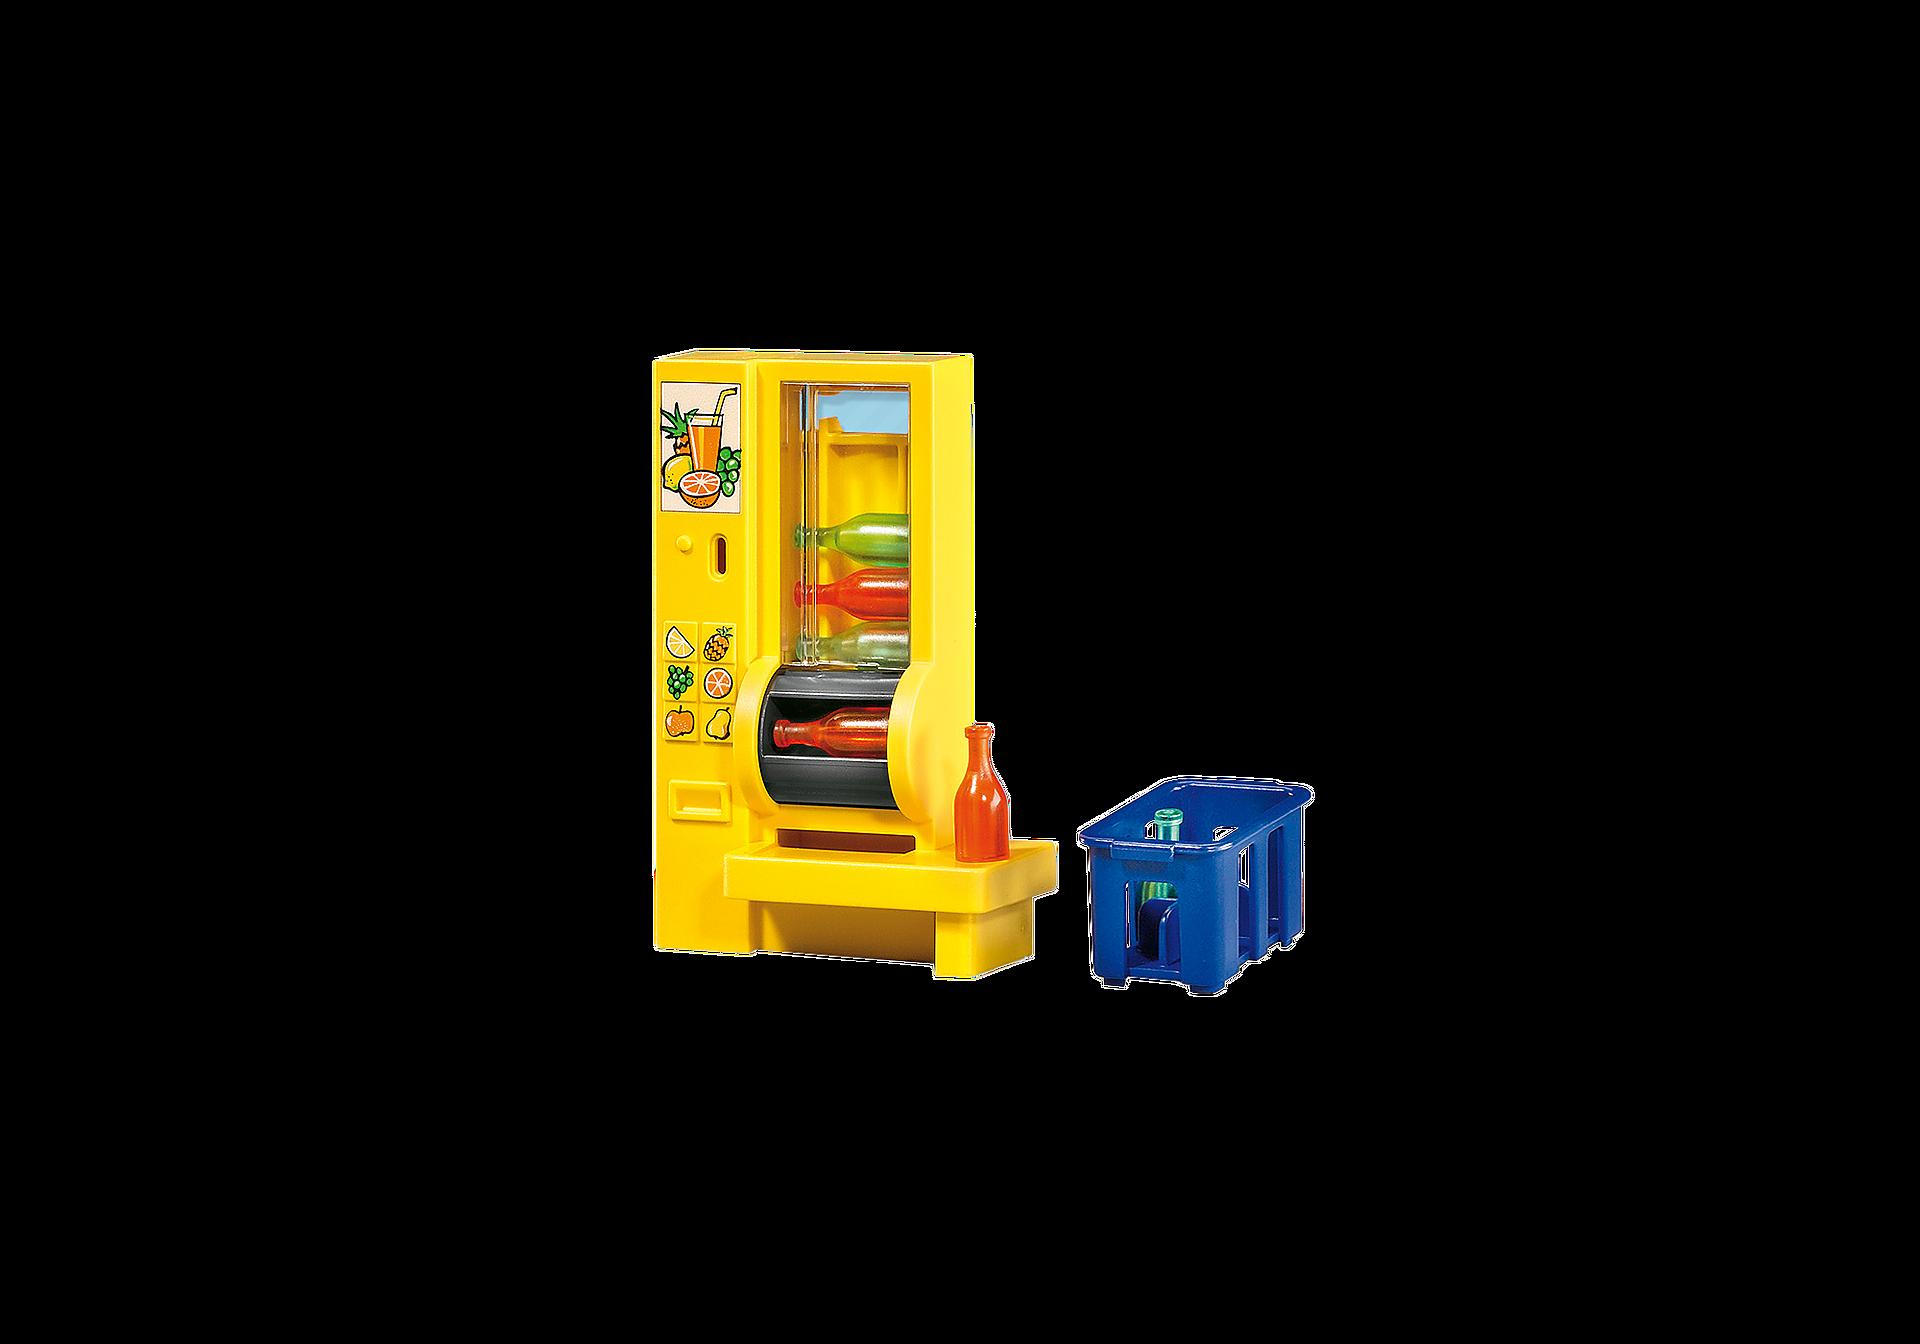 7931 Vending Machine zoom image1